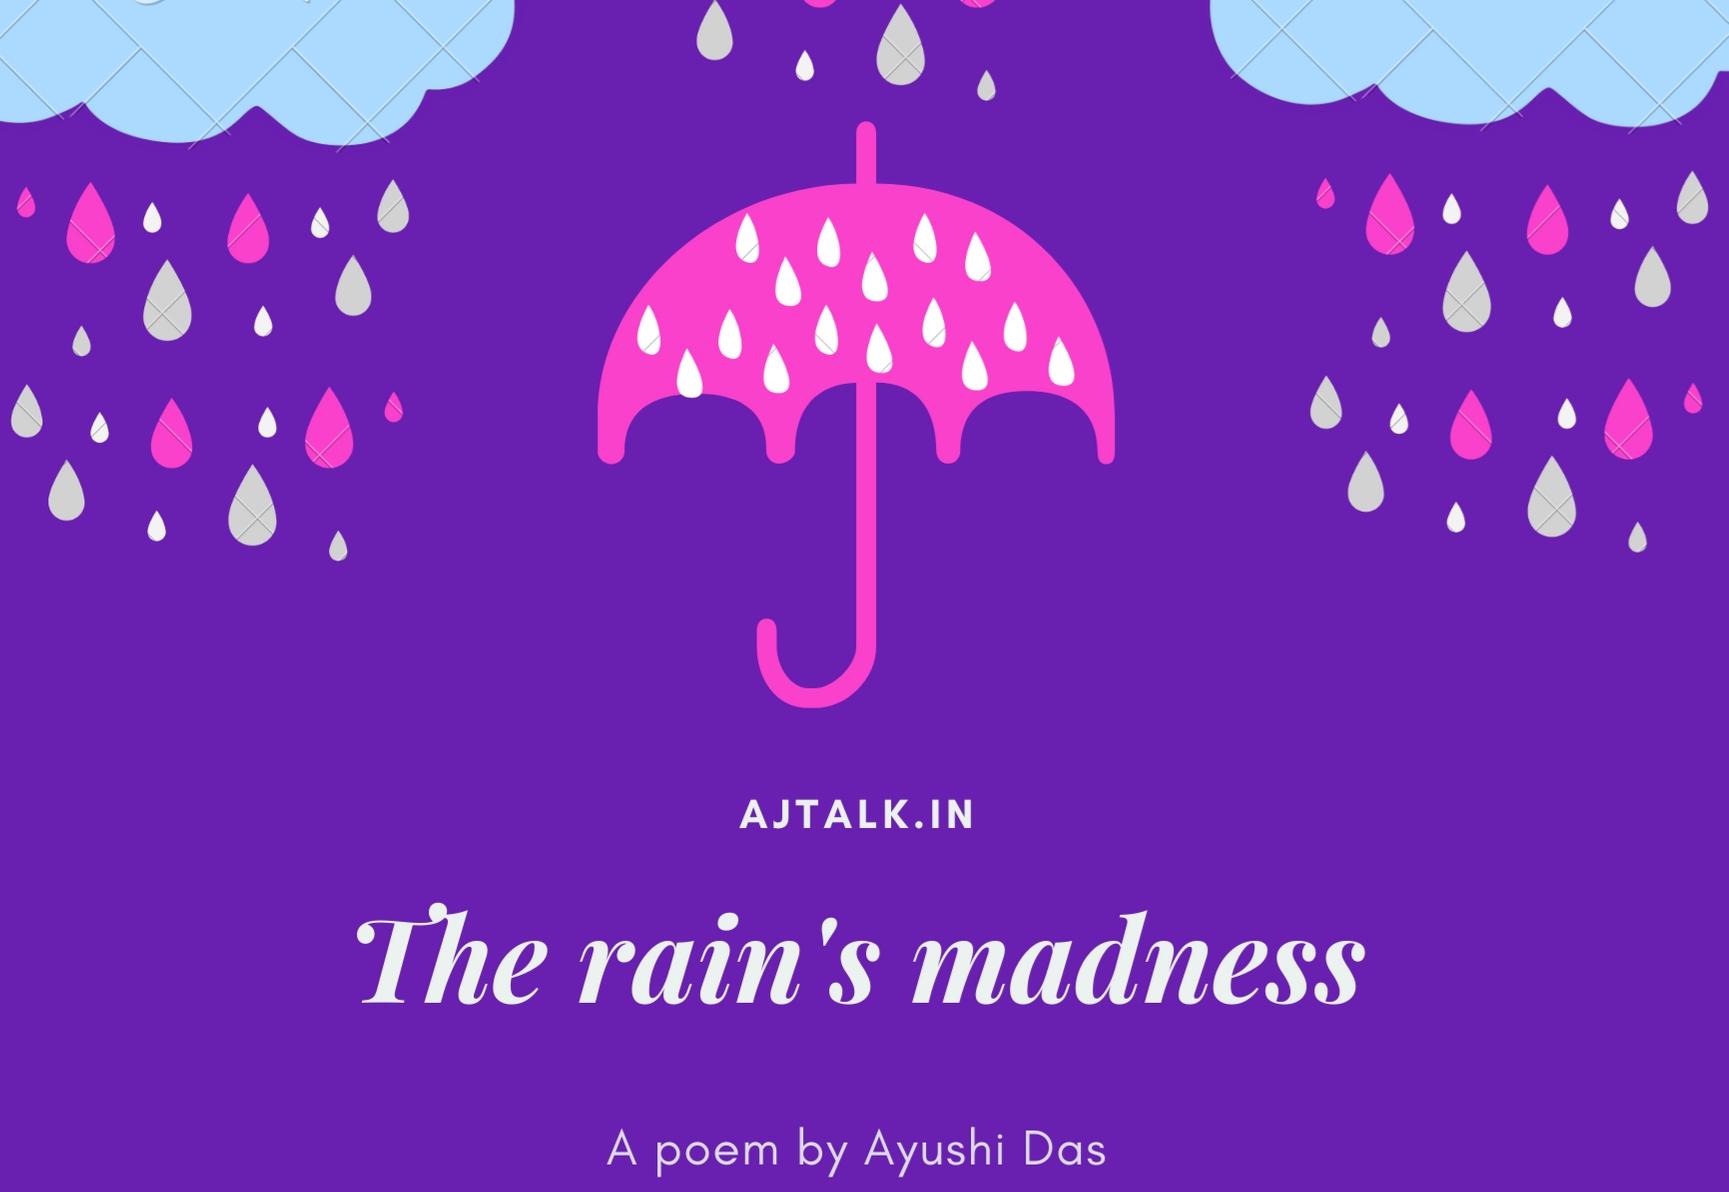 Rain and its madness